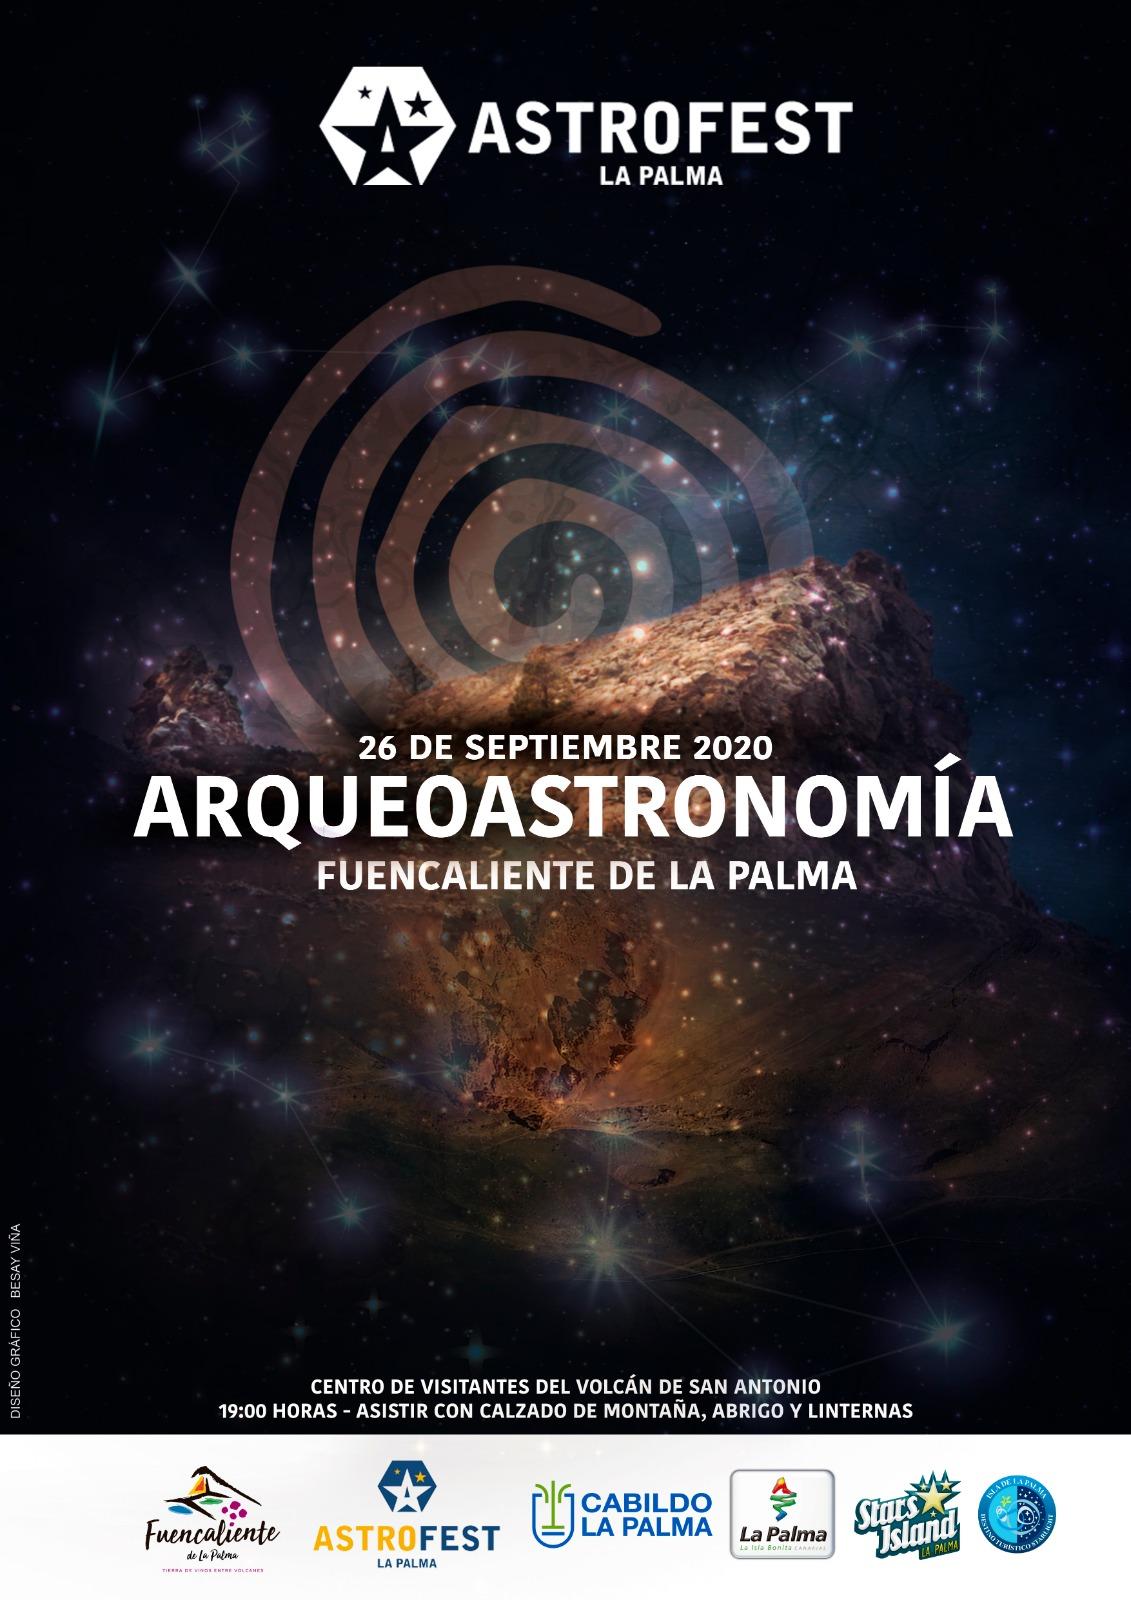 Arqueoastronomía - fuencaliente